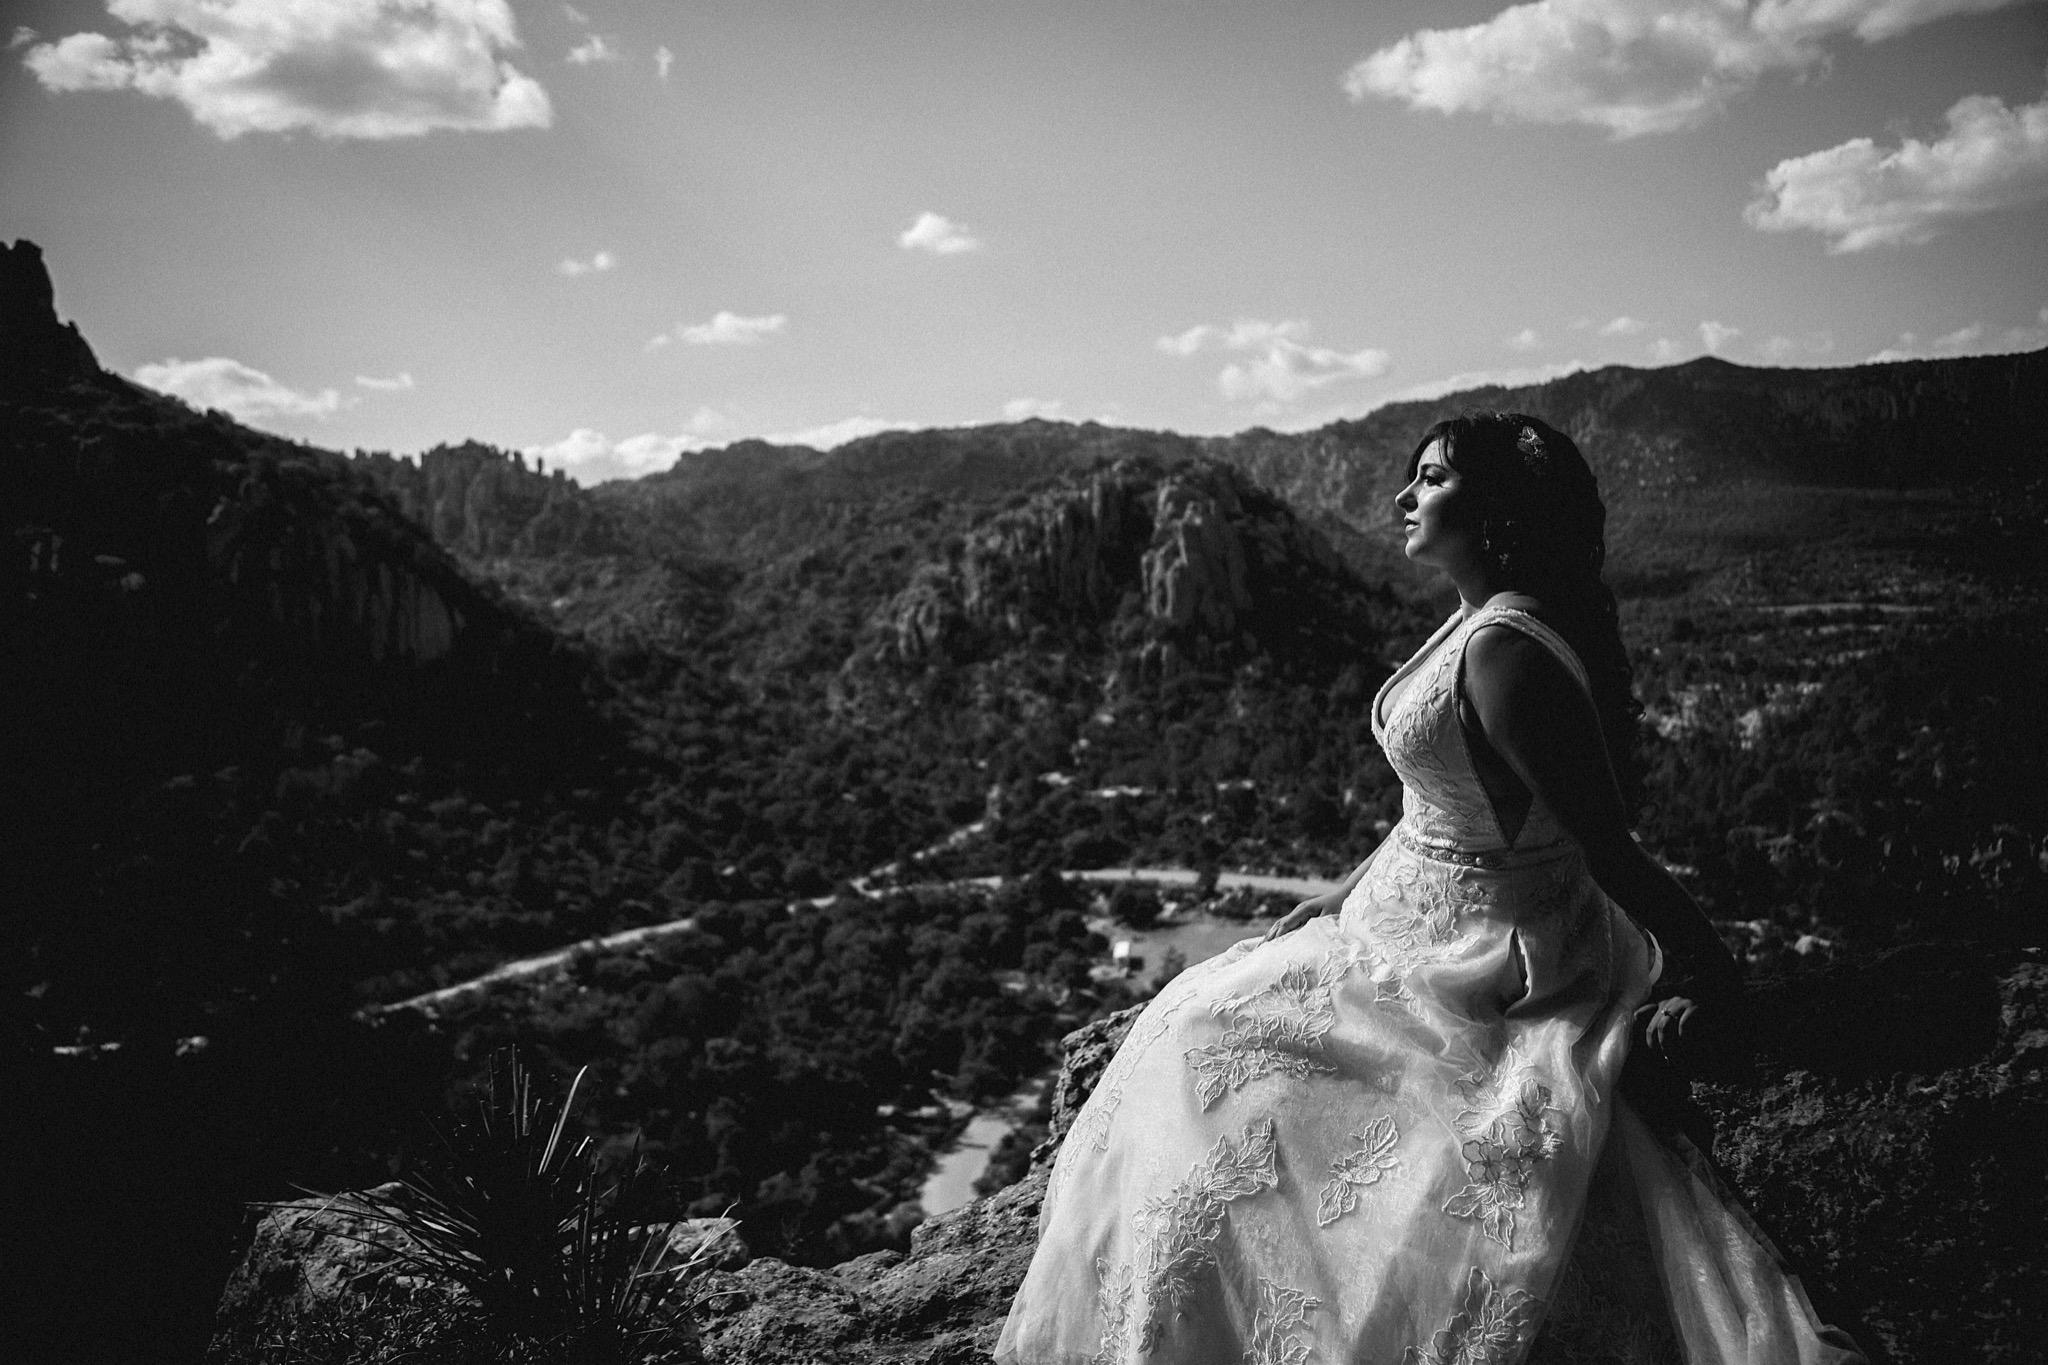 javier_noriega_fotografo_profesional_bodas_zacatecas_mexico_chihuahua_photographer_2